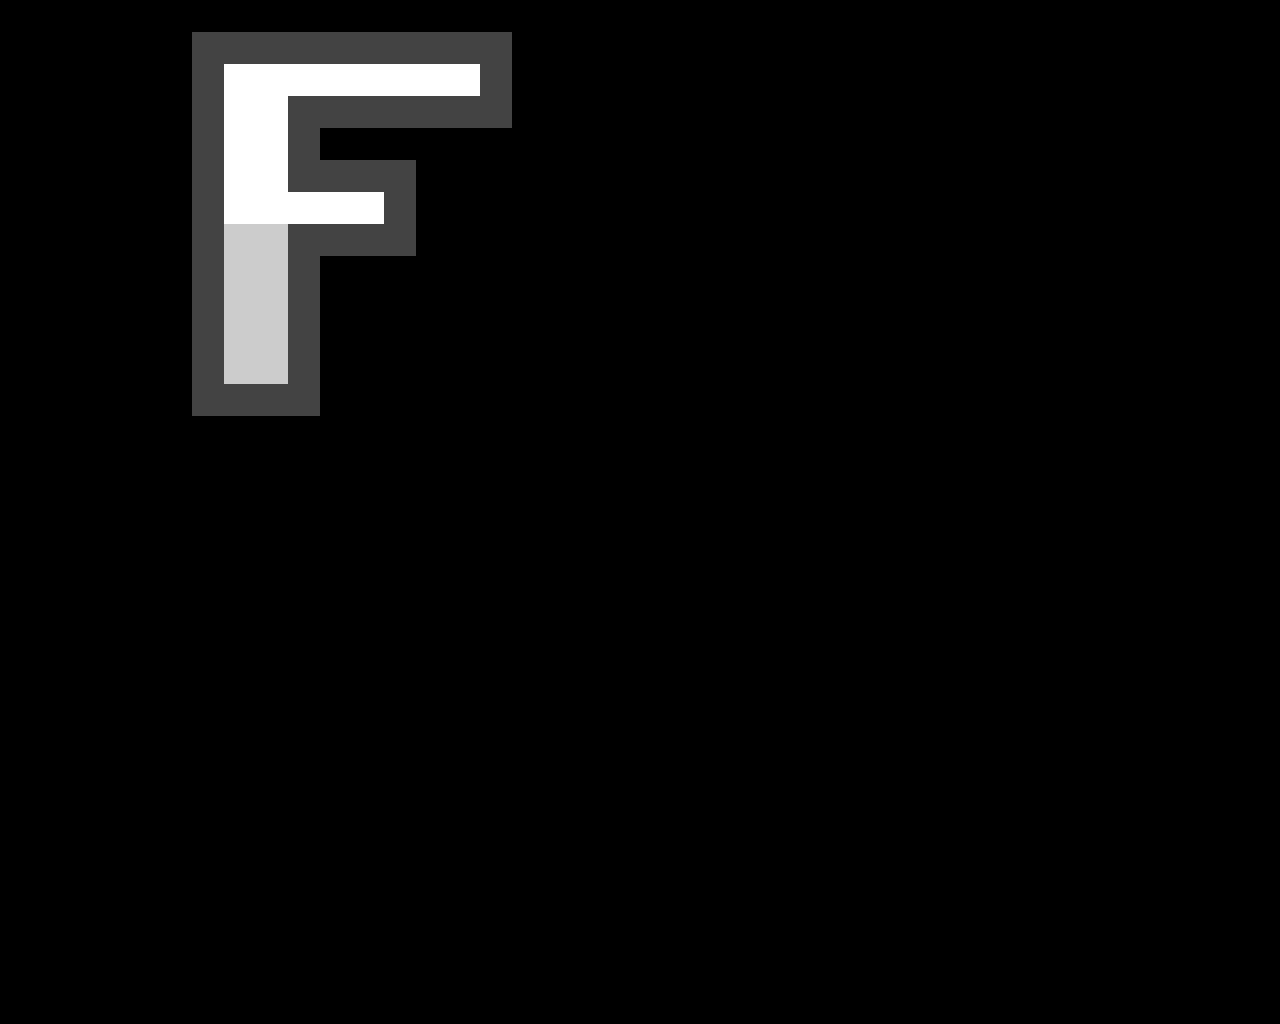 pixel letter F